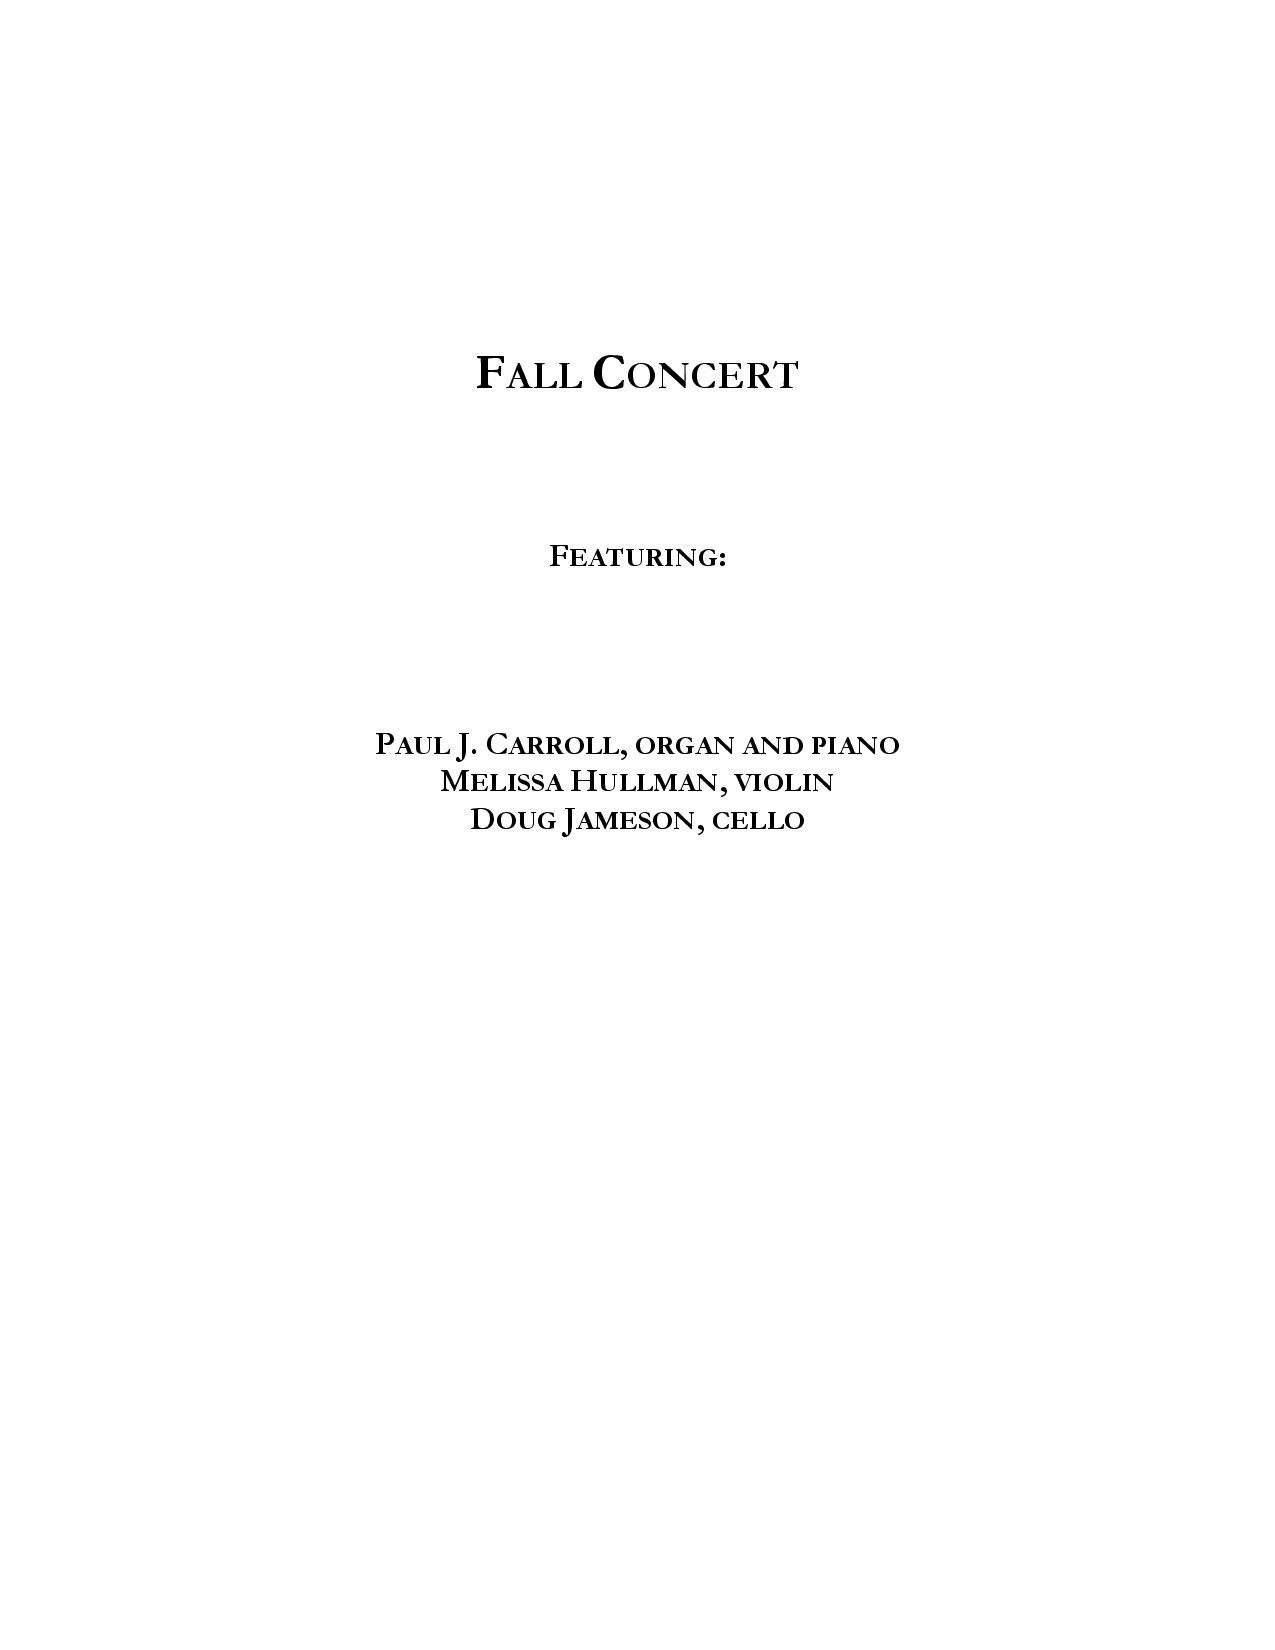 2009-10-25 - Program for Printing-page-002.jpg